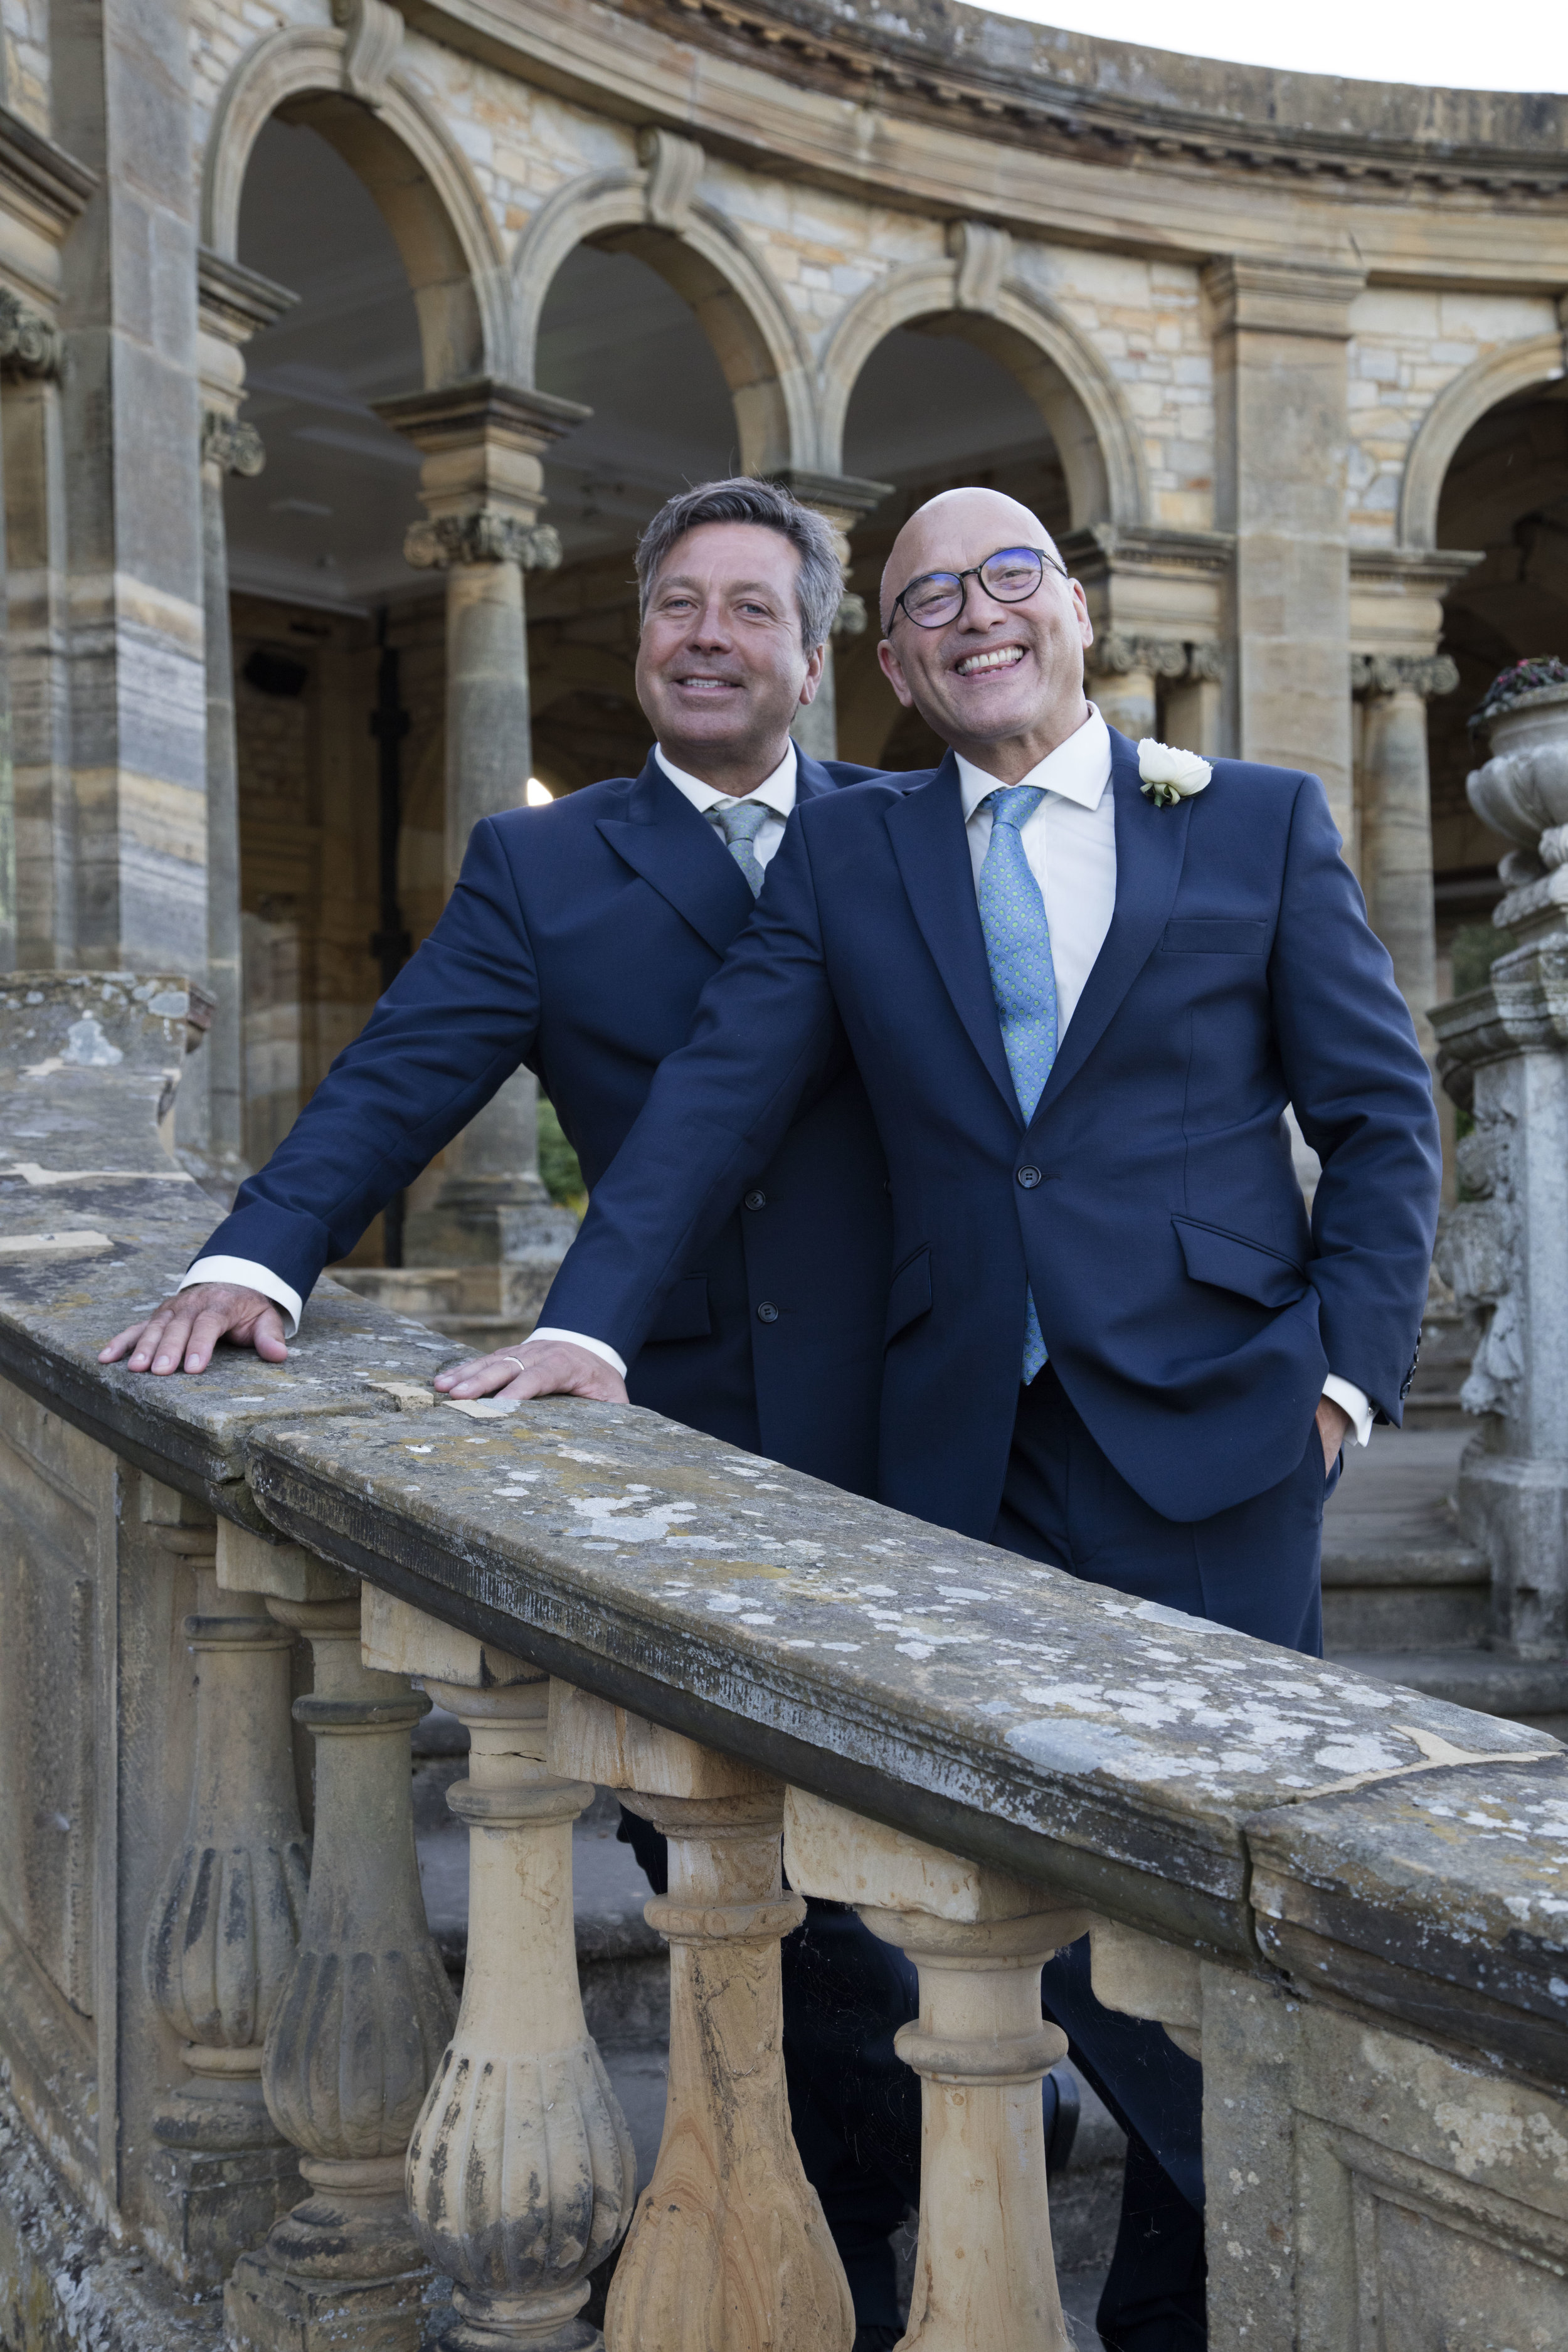 gregg-wallace-john-torode-celebrity-wedding-masterchef-blue-mohair-suit-british-all-uk-made-augustus-hare-tie-office-smoothie-shirt.jpg